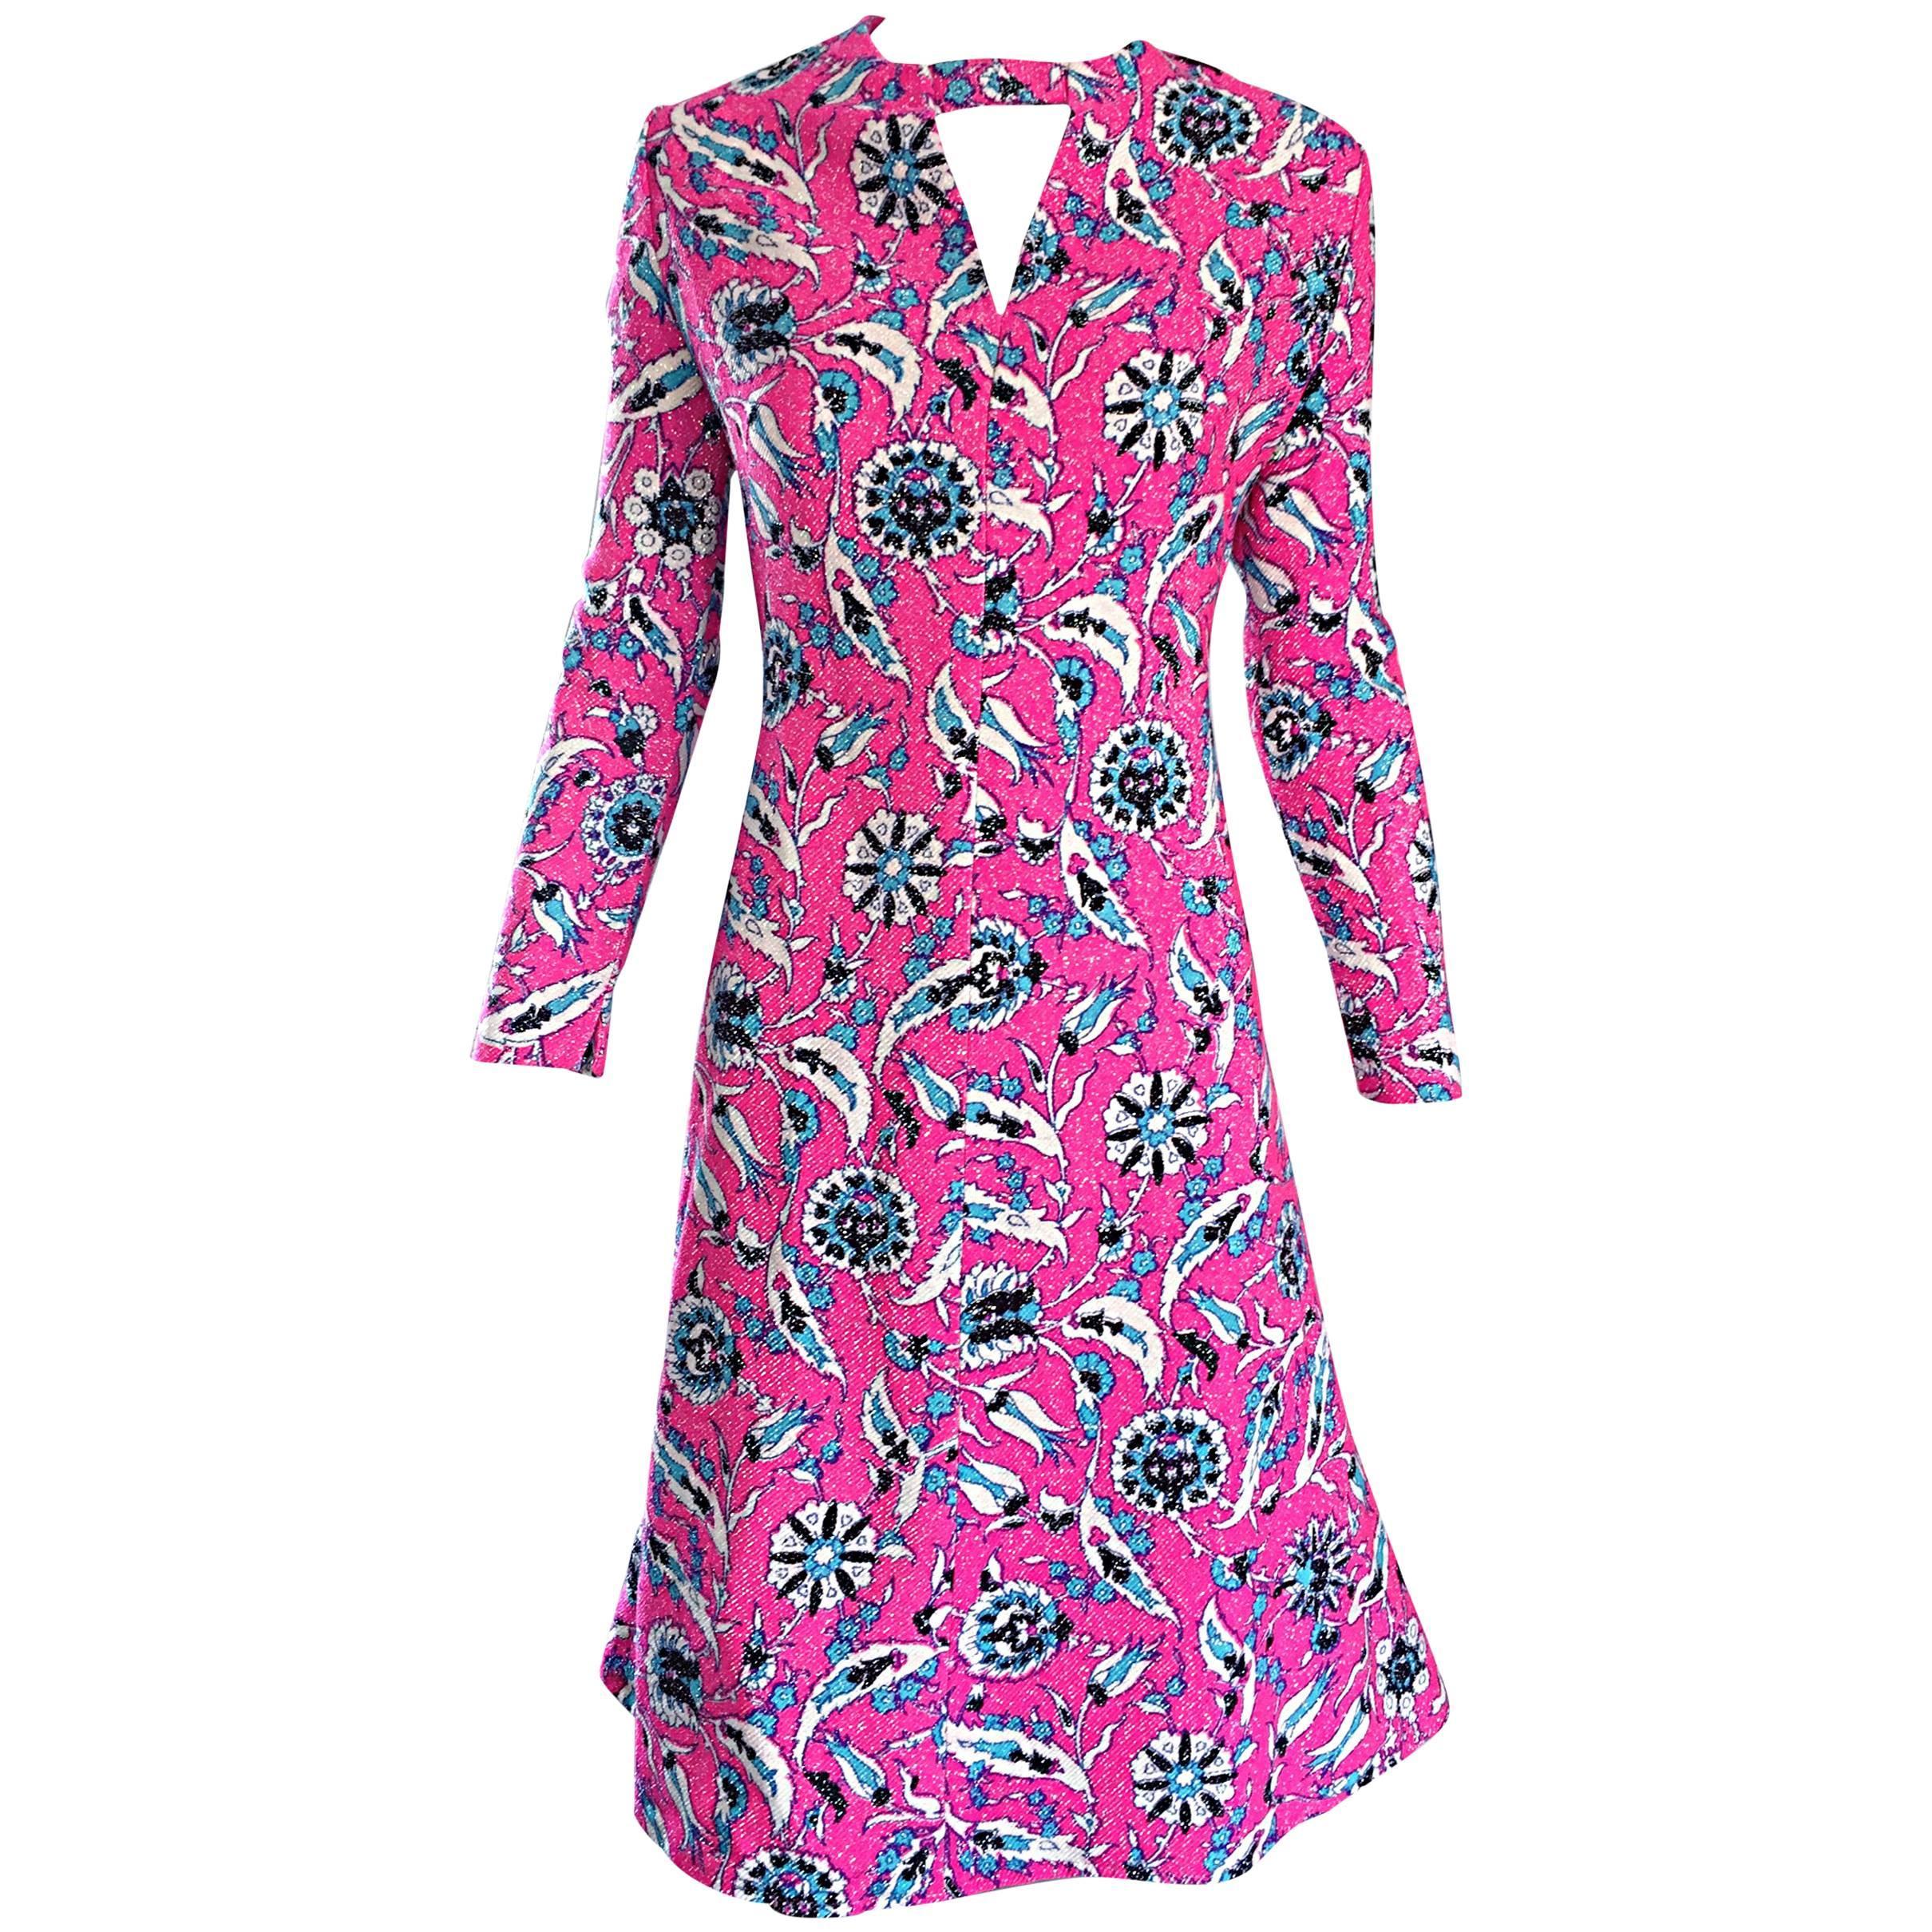 Vintage Adele Simpson Plus Size 1960s Hot Pink + Silver + Blue Metallic Dress